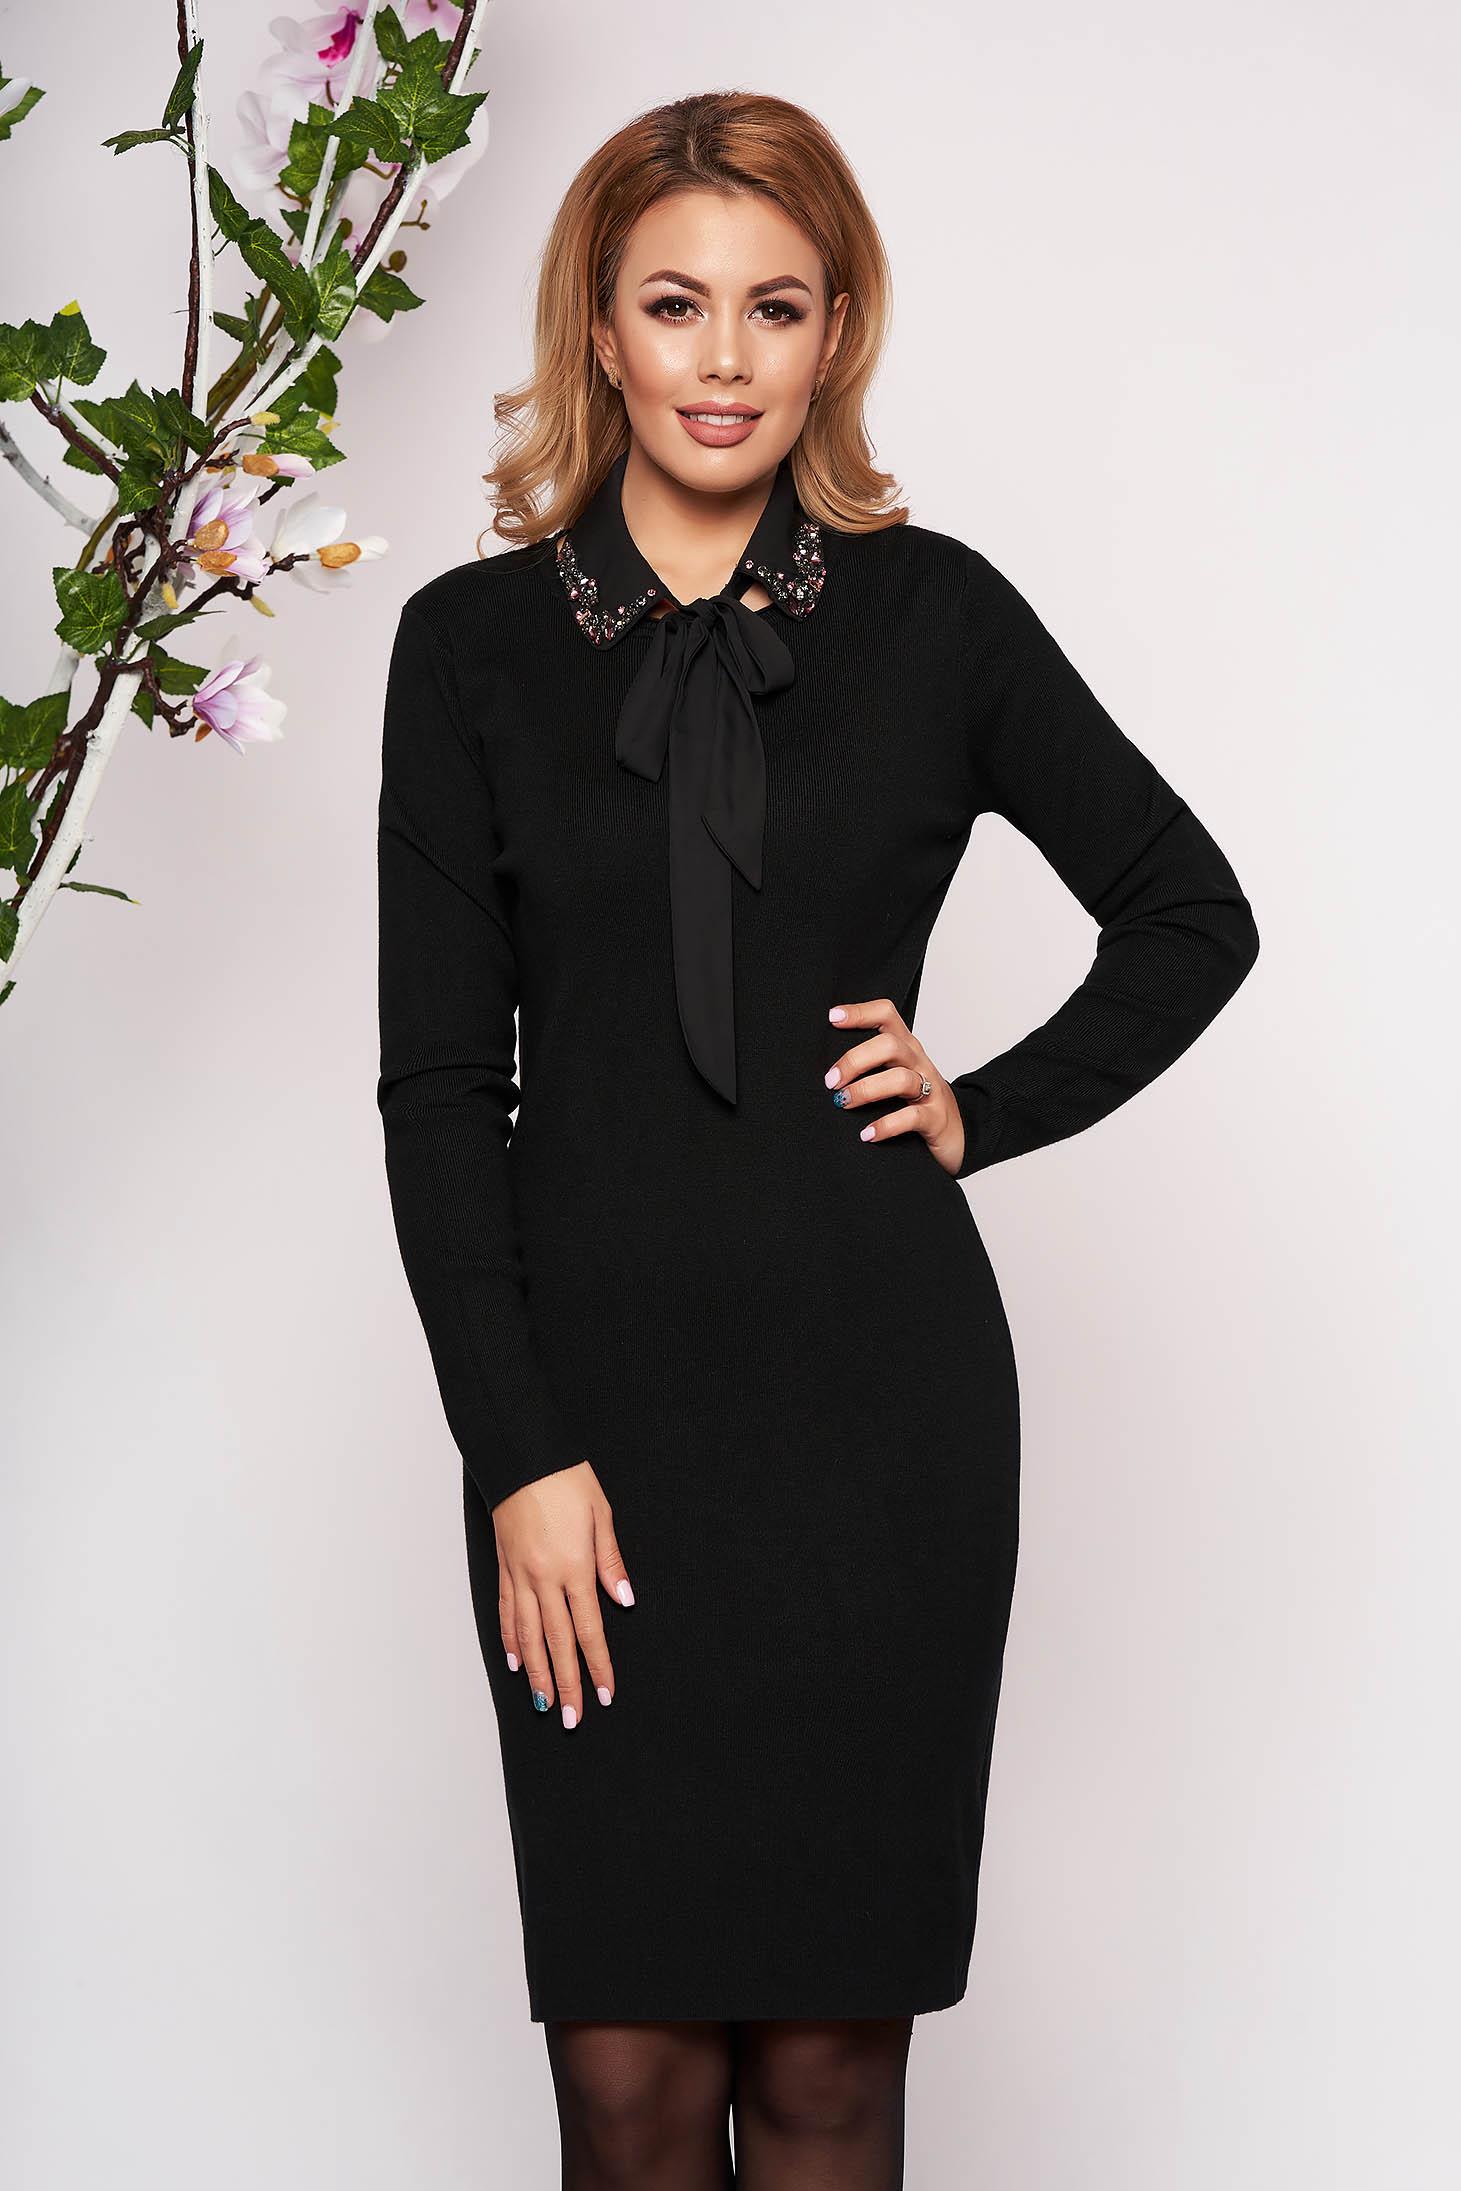 Black dress elegant short cut knitted pencil detachable collar long sleeved neckline